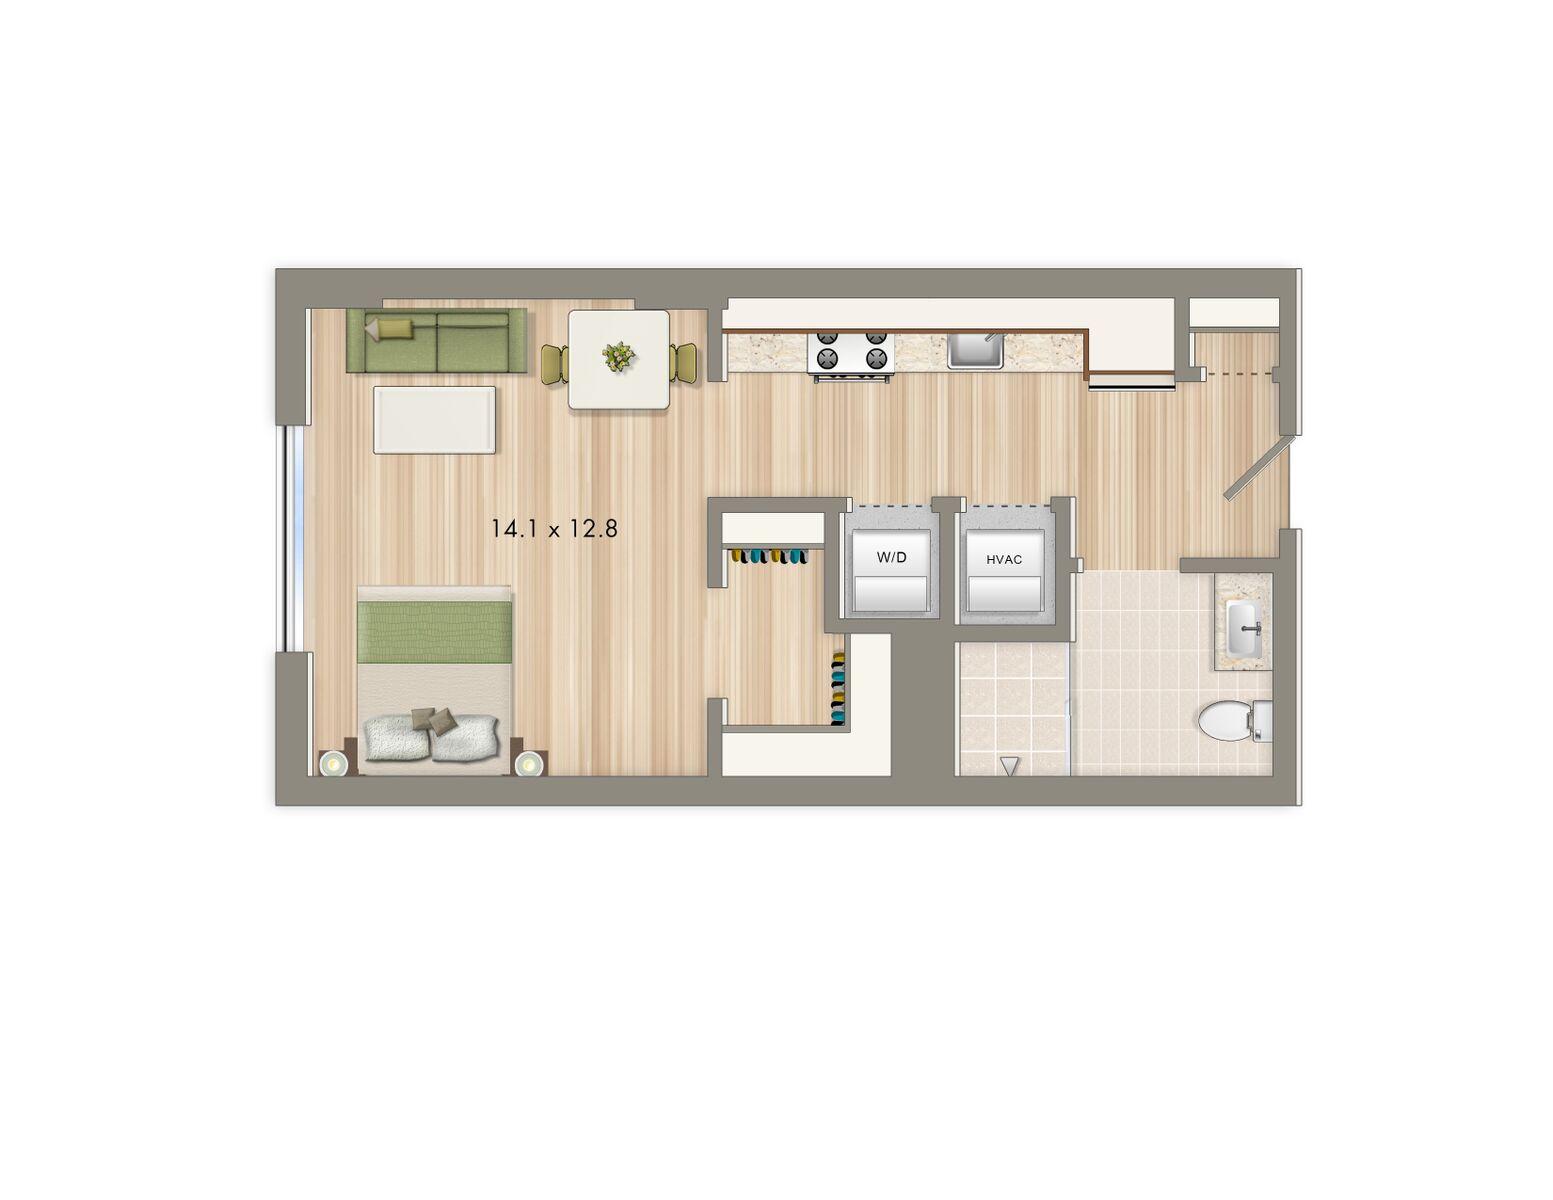 Park chelsea floorplan release studio apartments the for Studio apartment plans 16x32